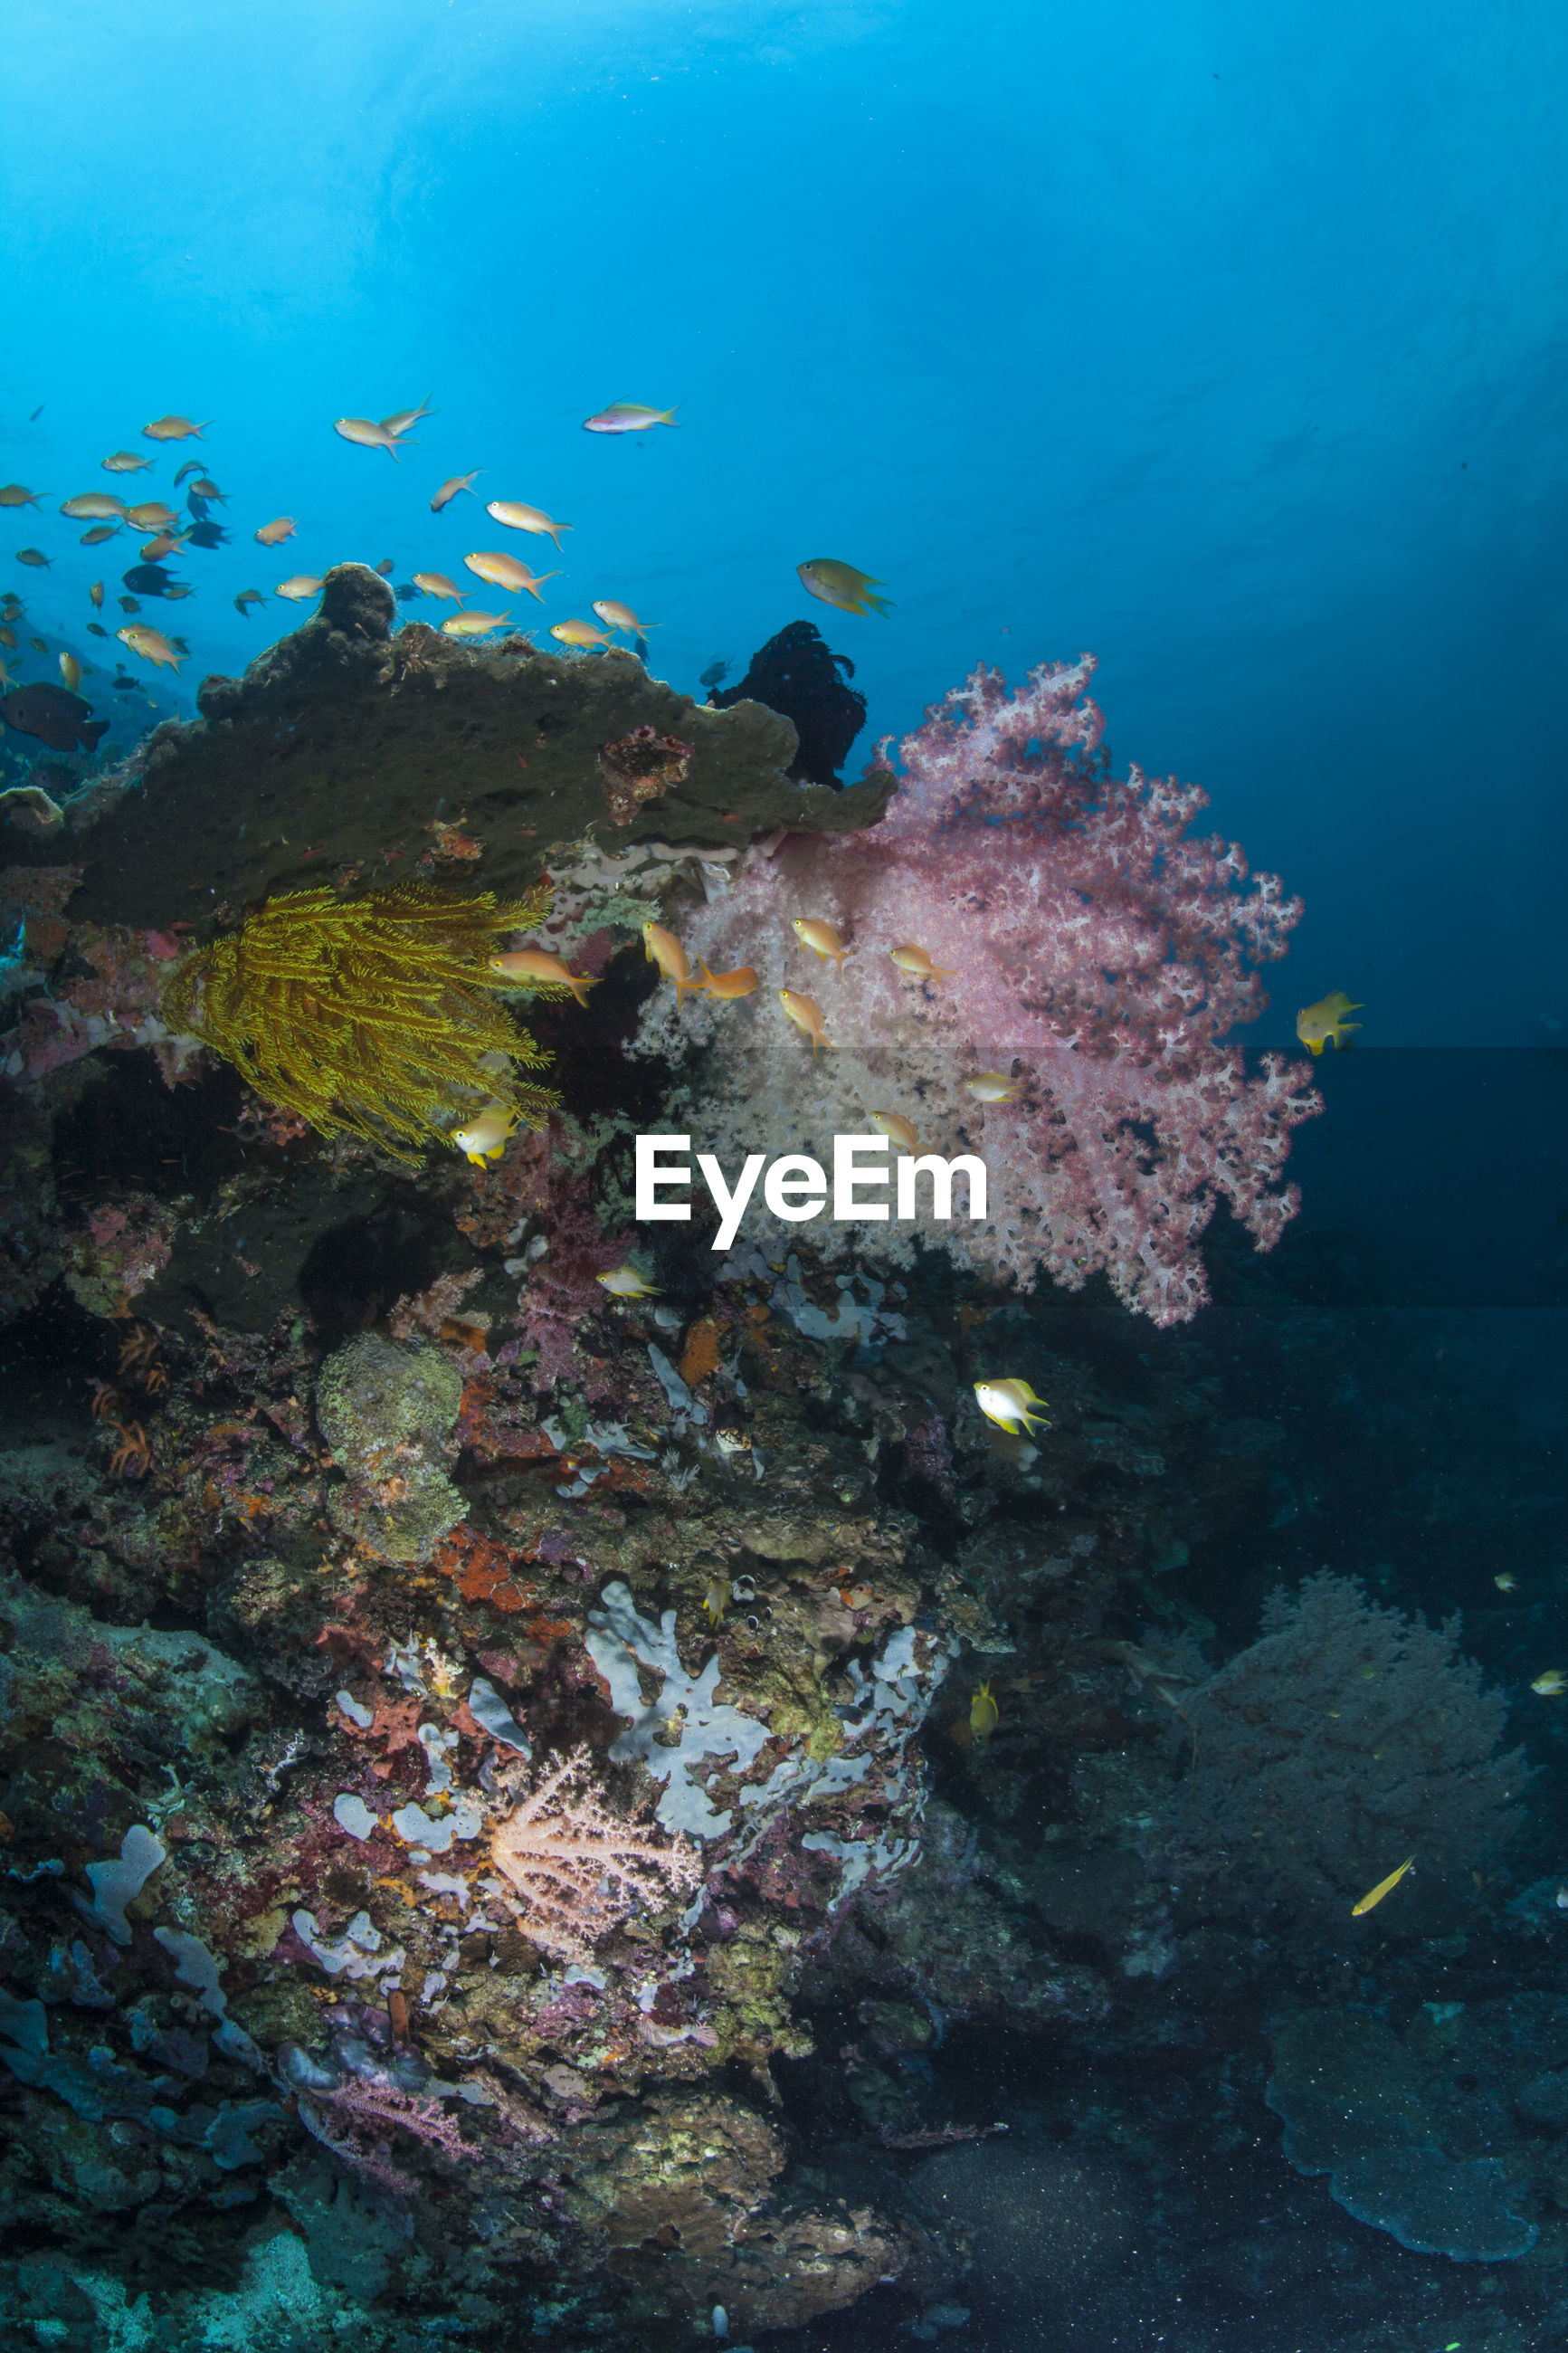 Scenic view of fishes swimming underwater